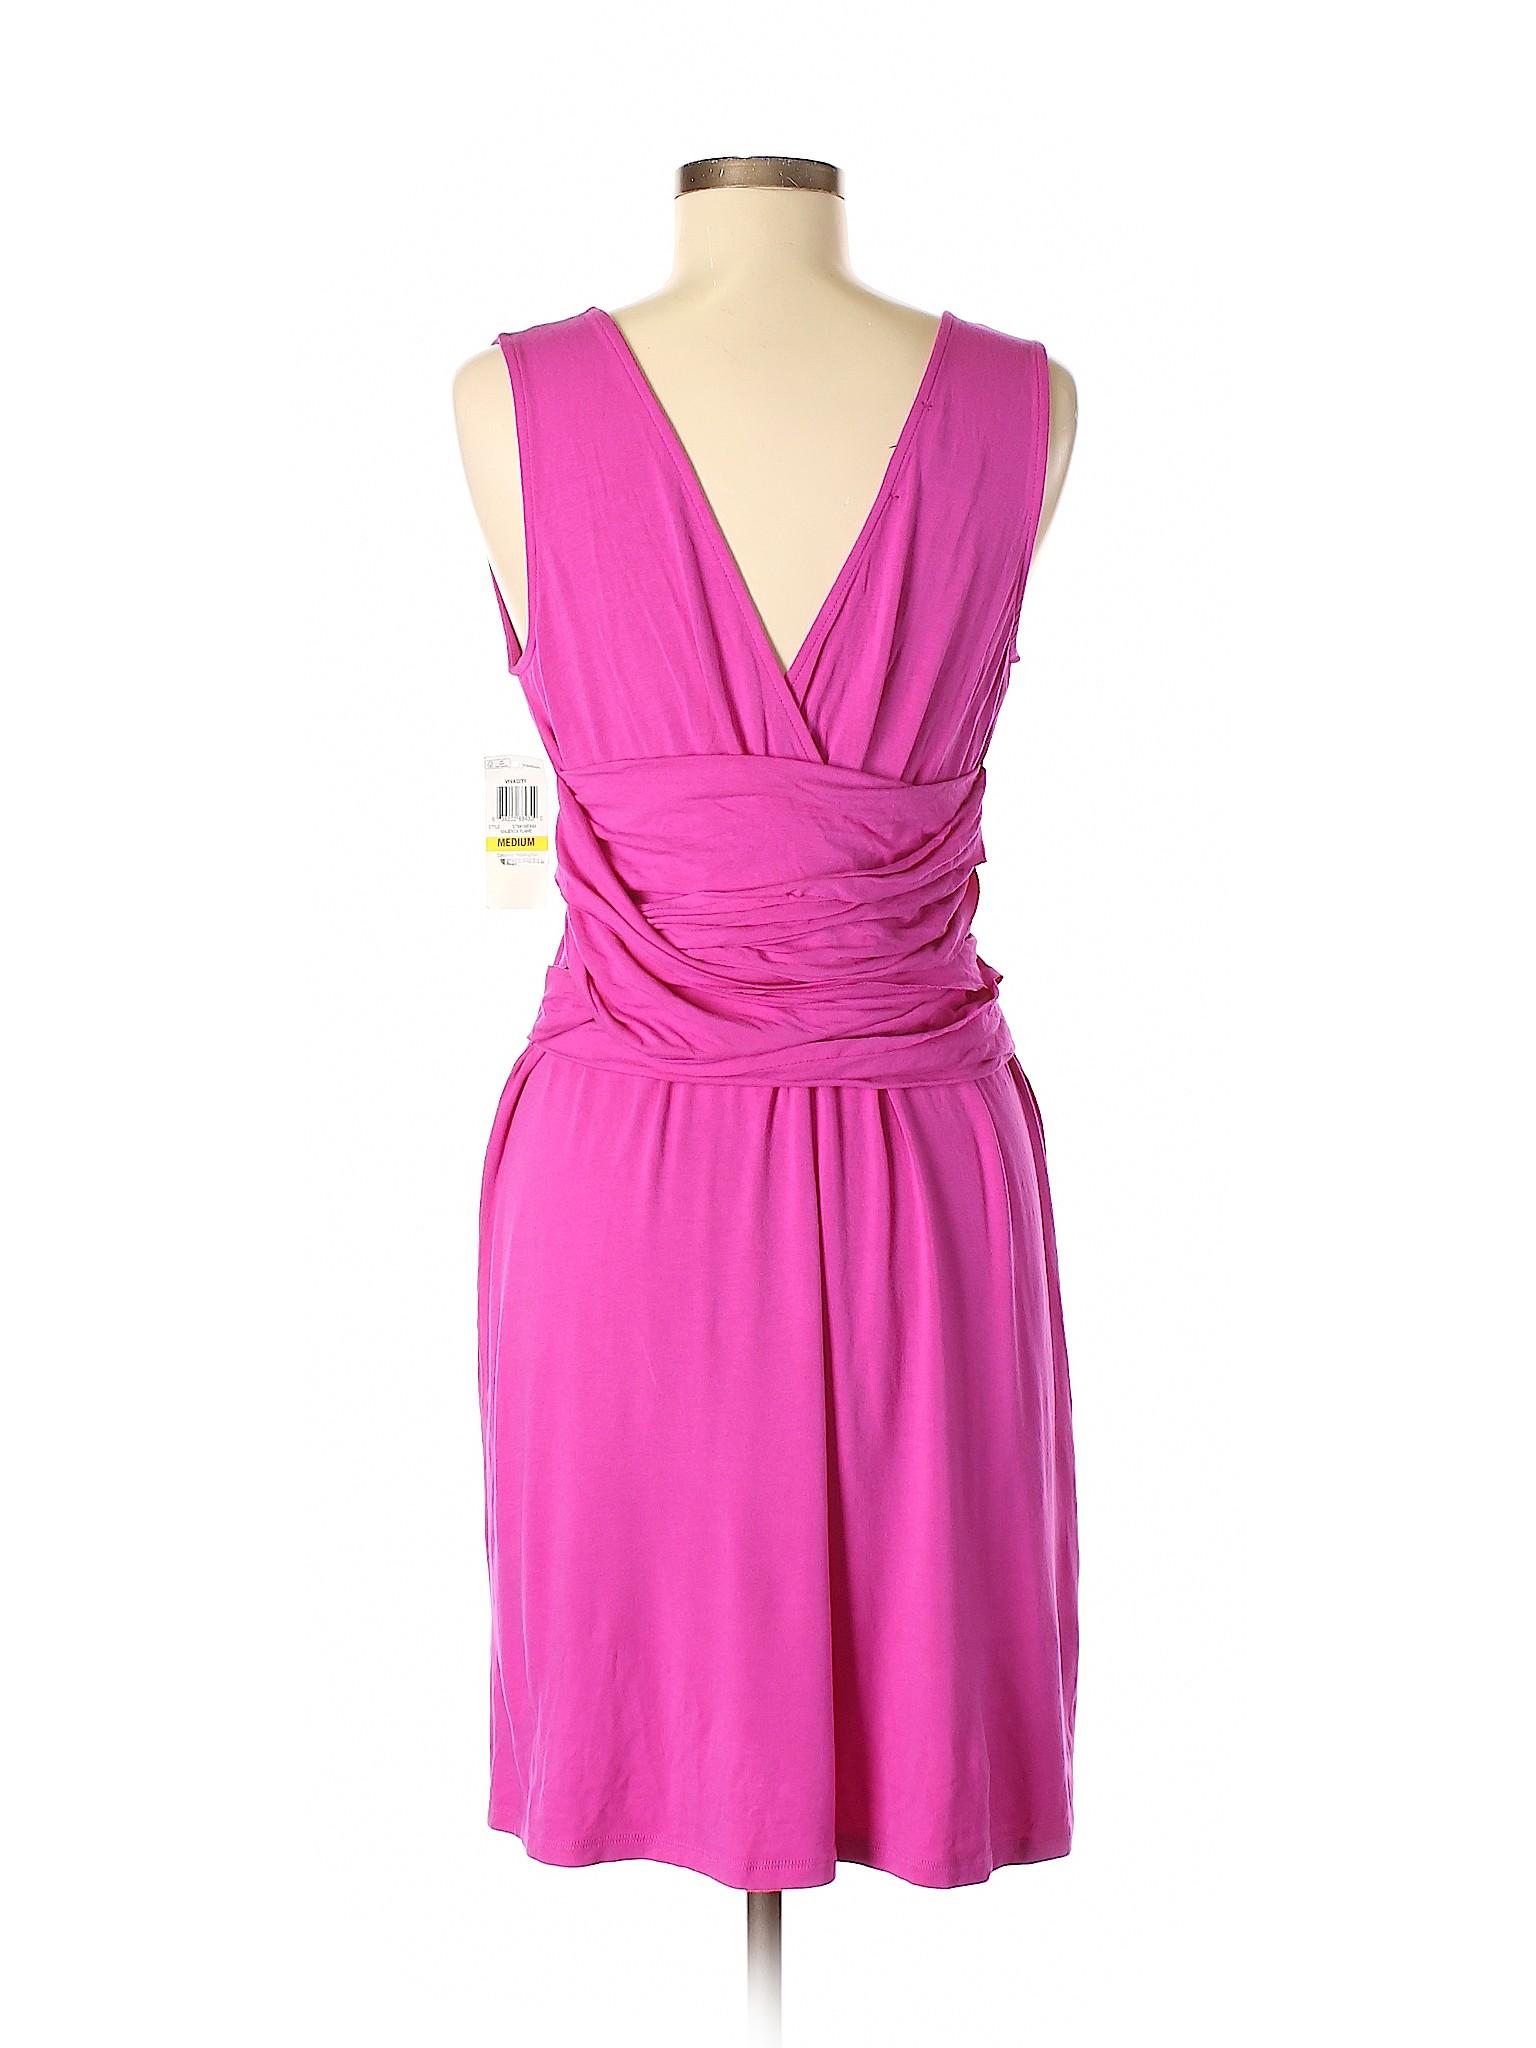 Dress Casual INC Concepts International Boutique winter wB4qaa